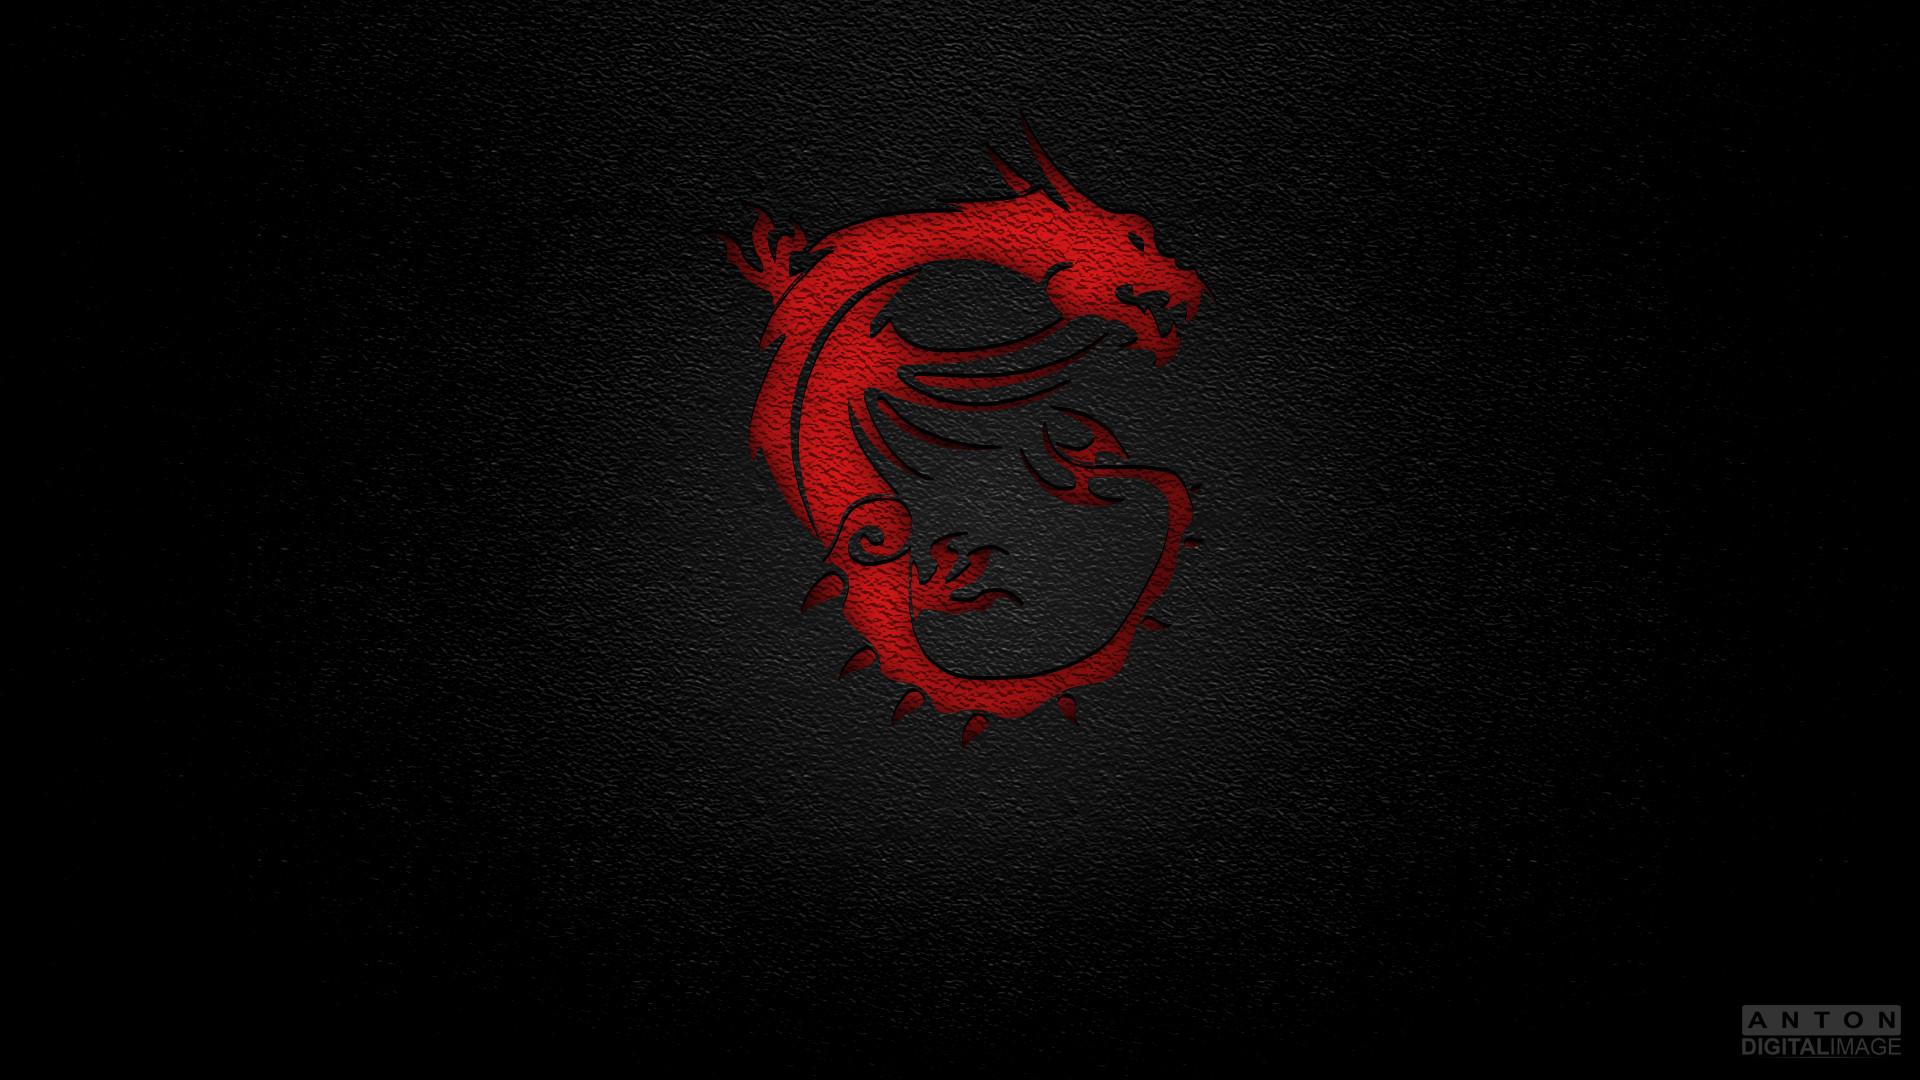 … MSI Dragon Gaming Series Wallpaper 1080p by Thony32